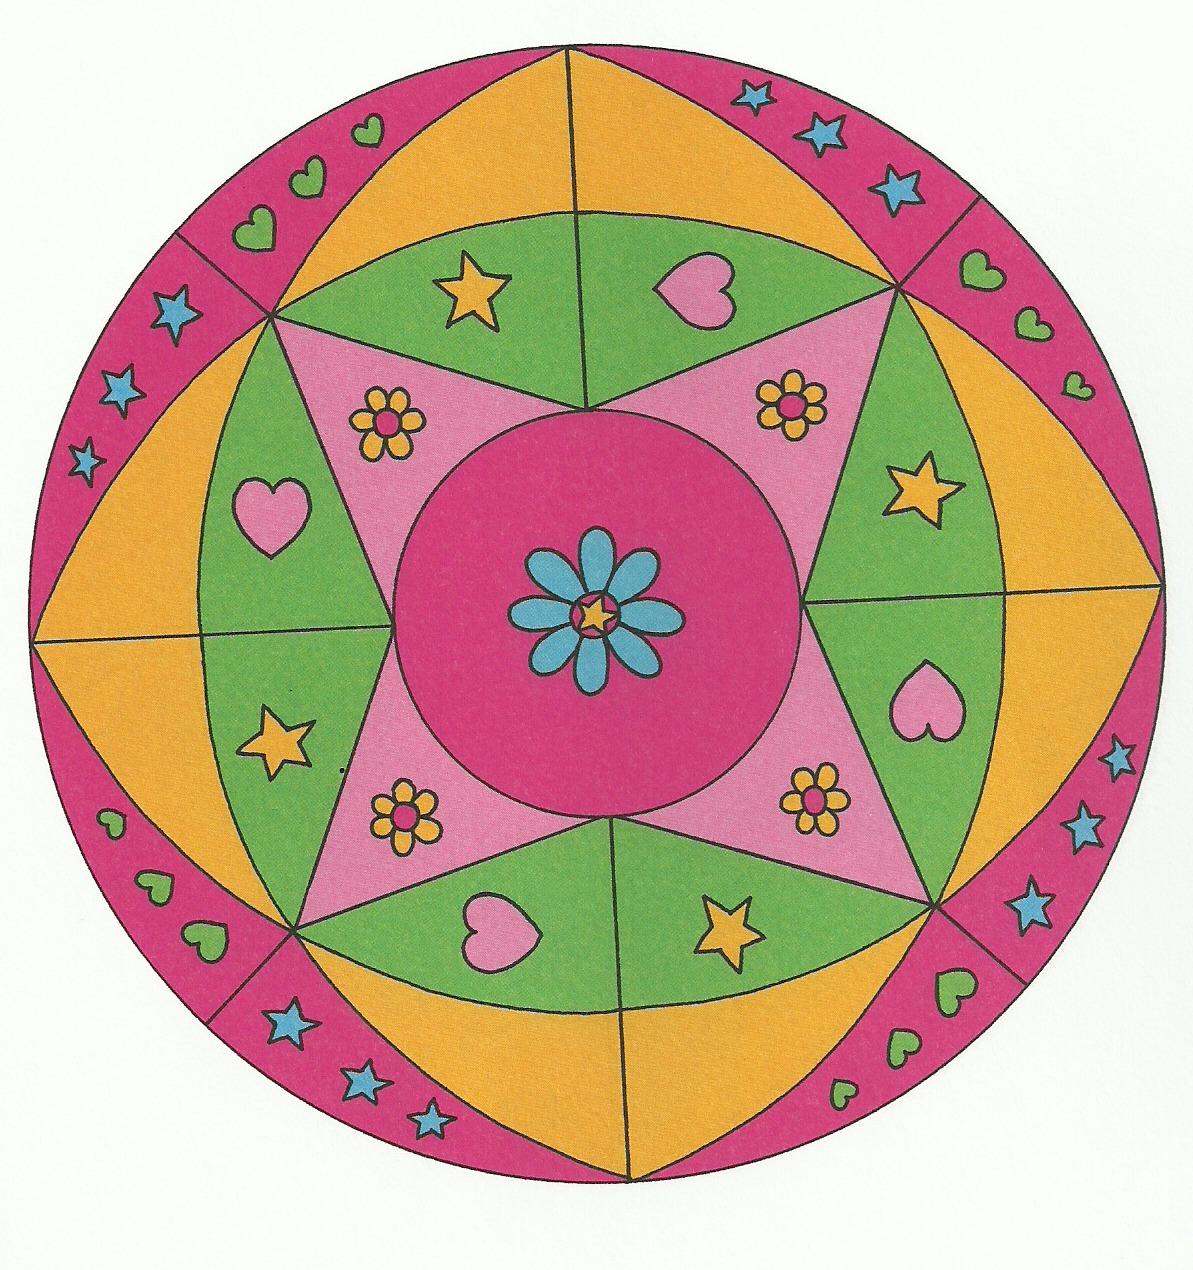 Los pepinillos en vinagre mandalas divertidos para ni os for Mandalas ninos